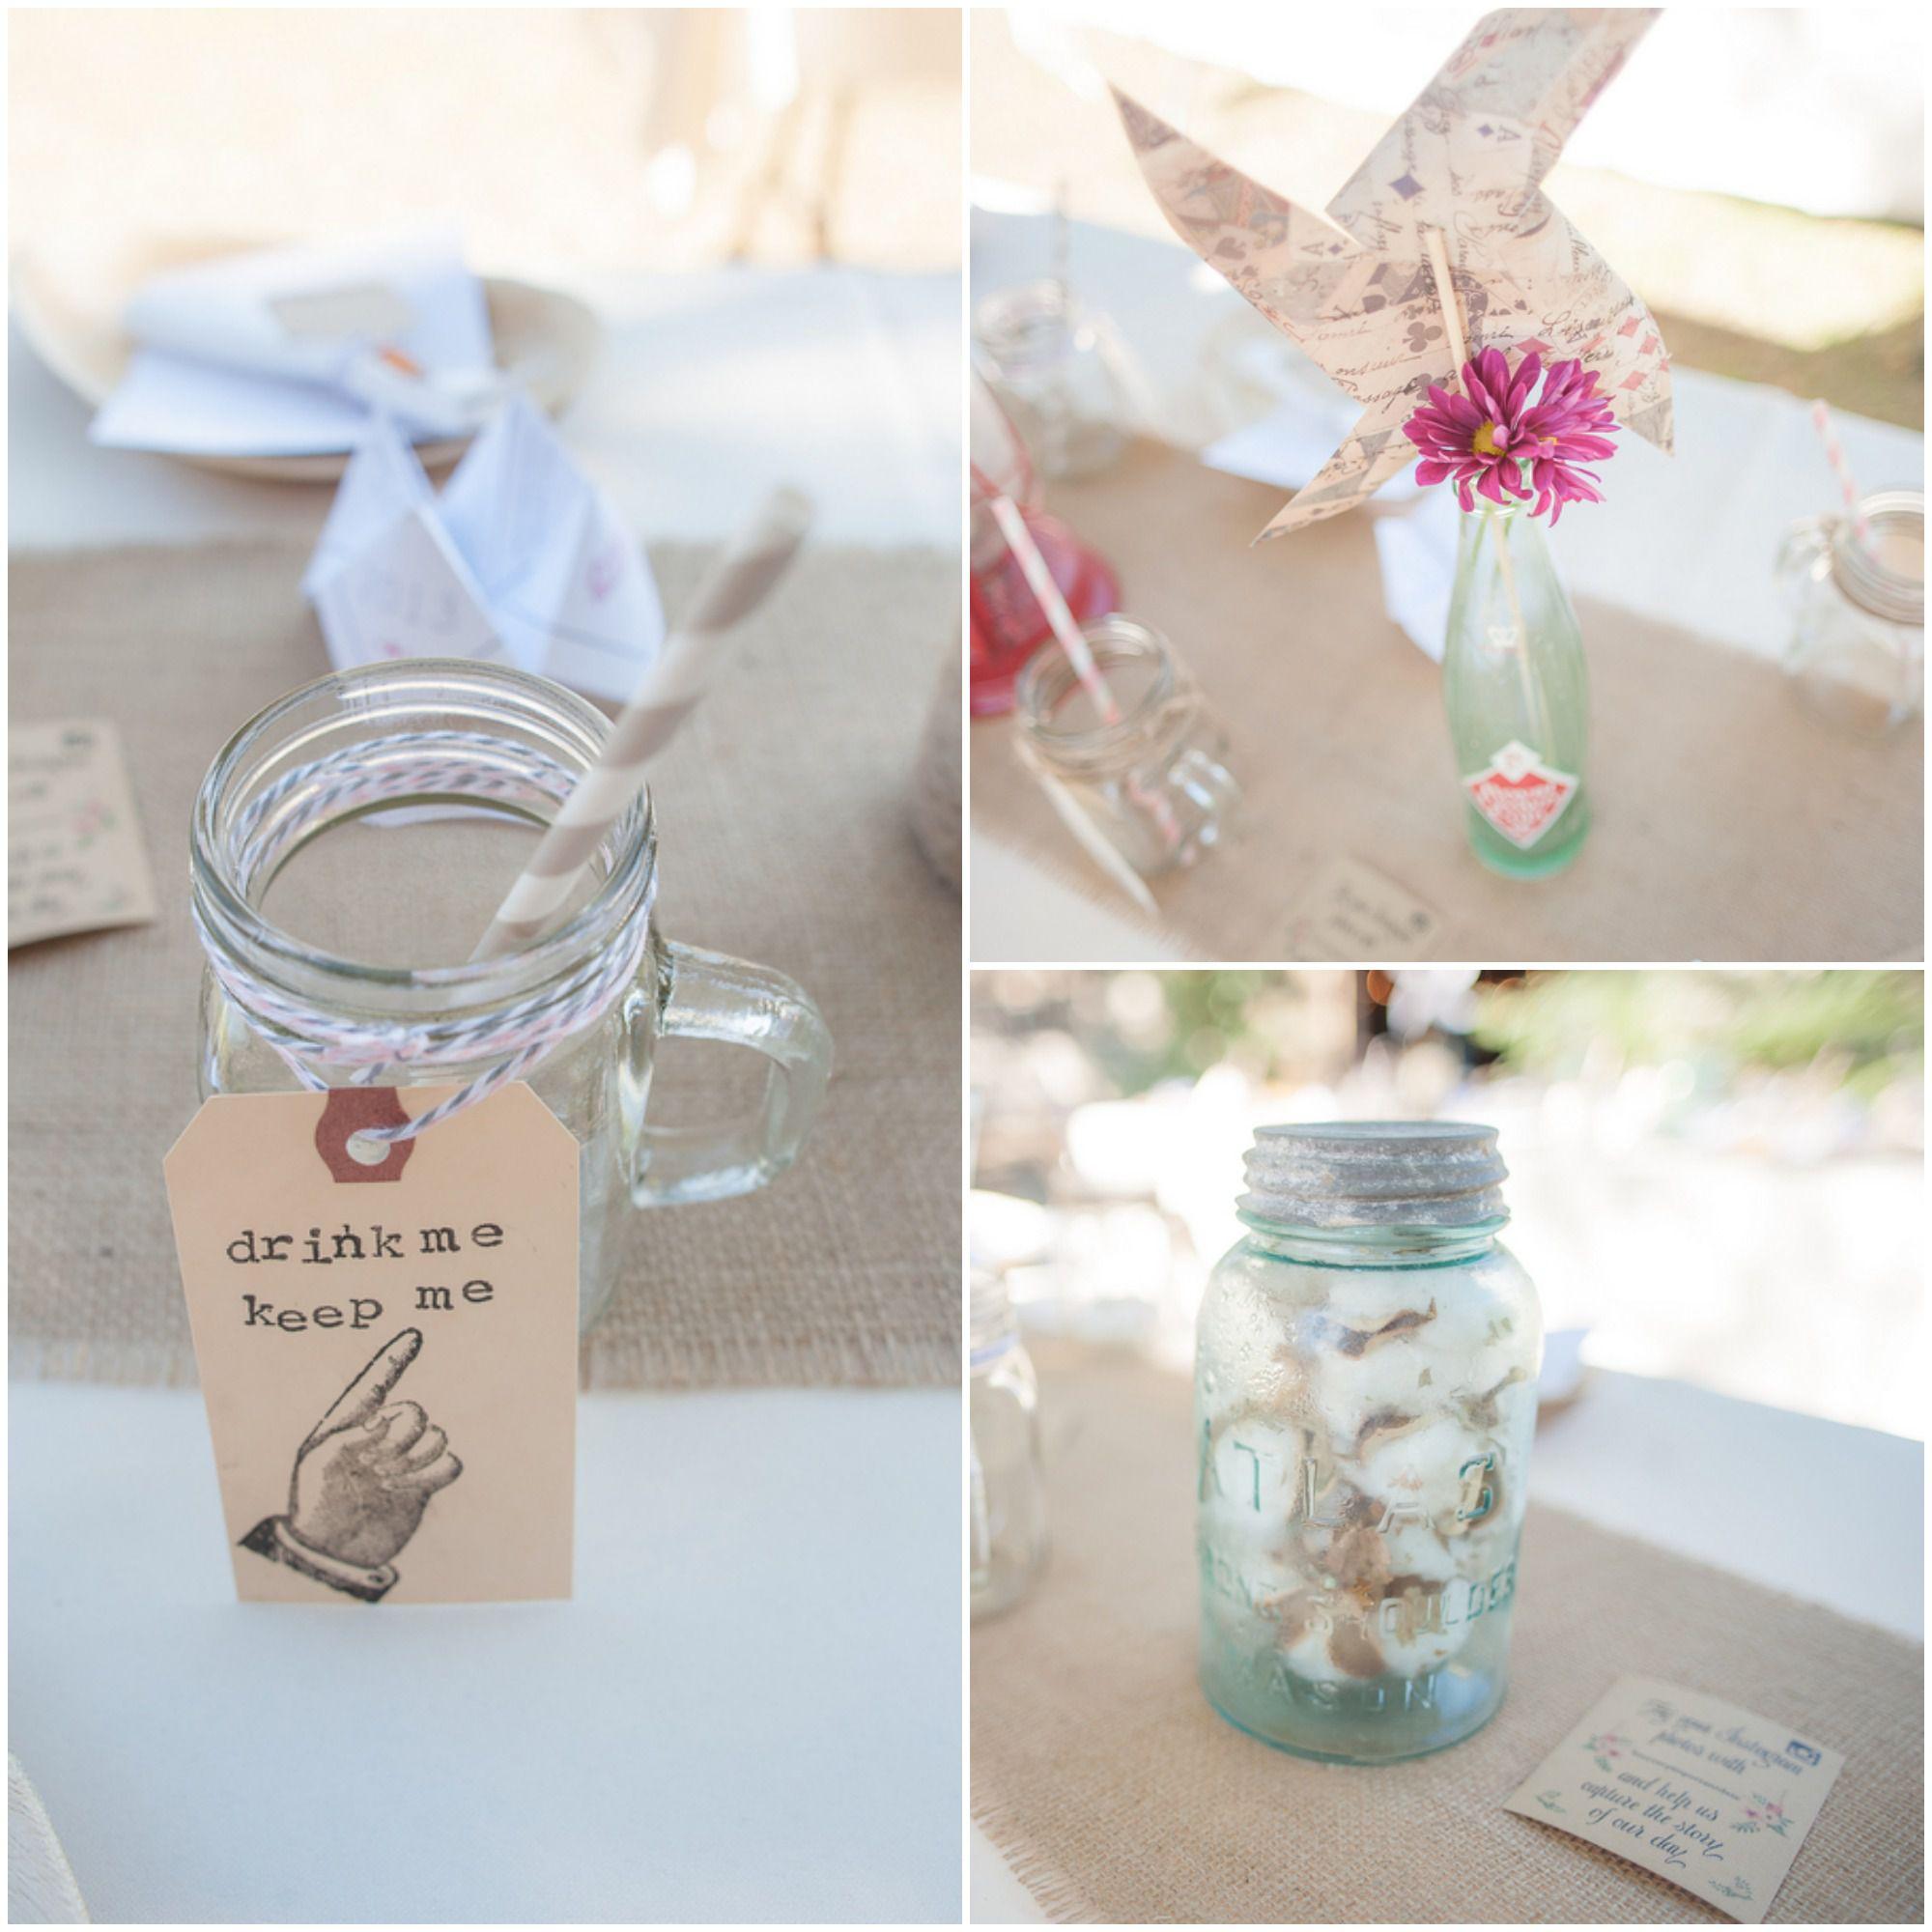 Southern Rustic Ranch Wedding - Rustic Wedding Chic